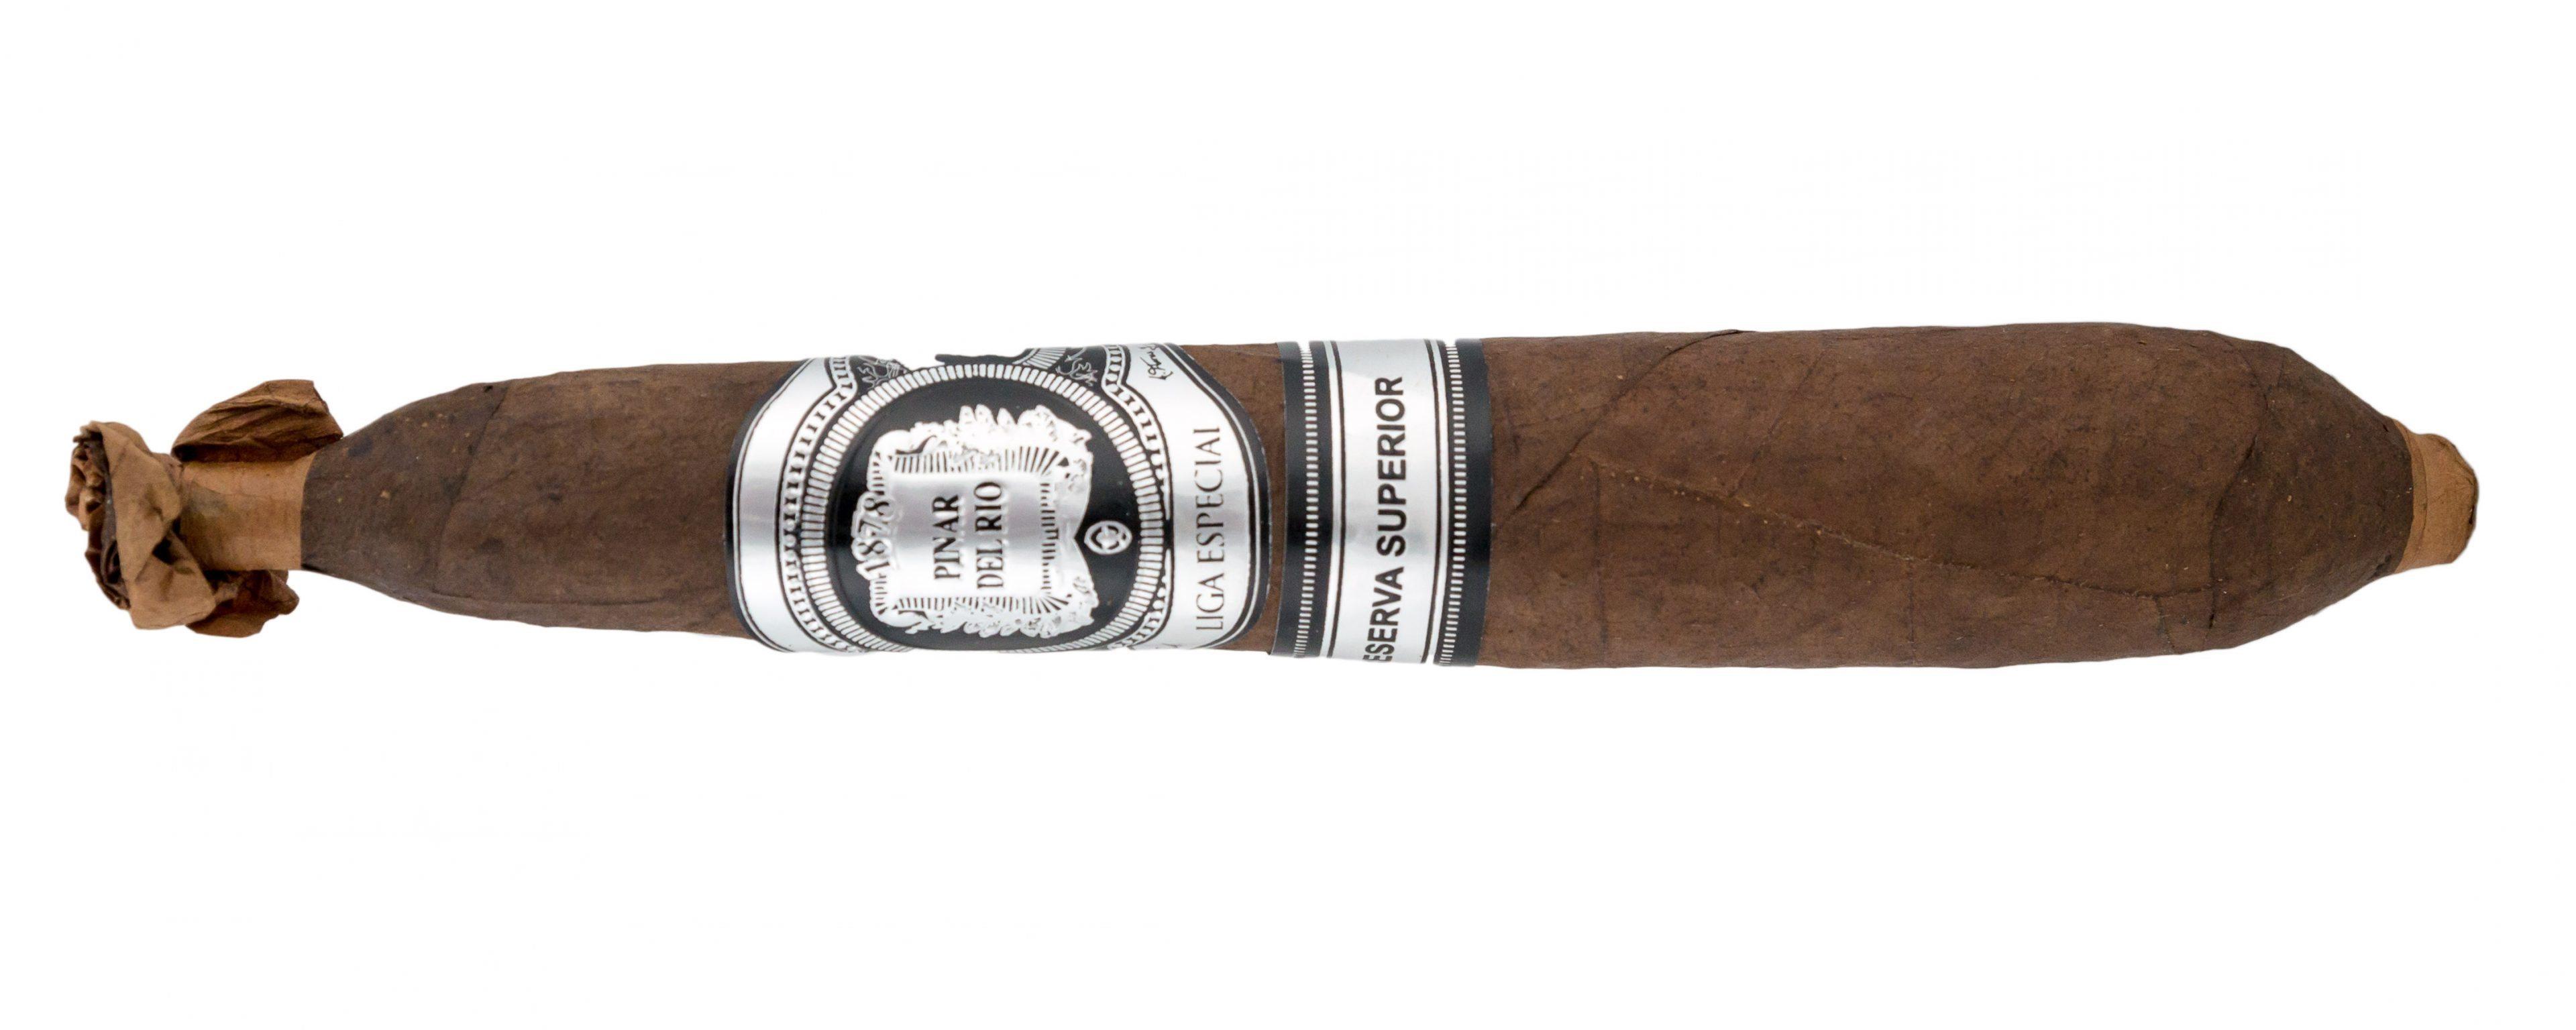 Quick Cigar Review: Pinar del Rio | Reserva Superior Salomon